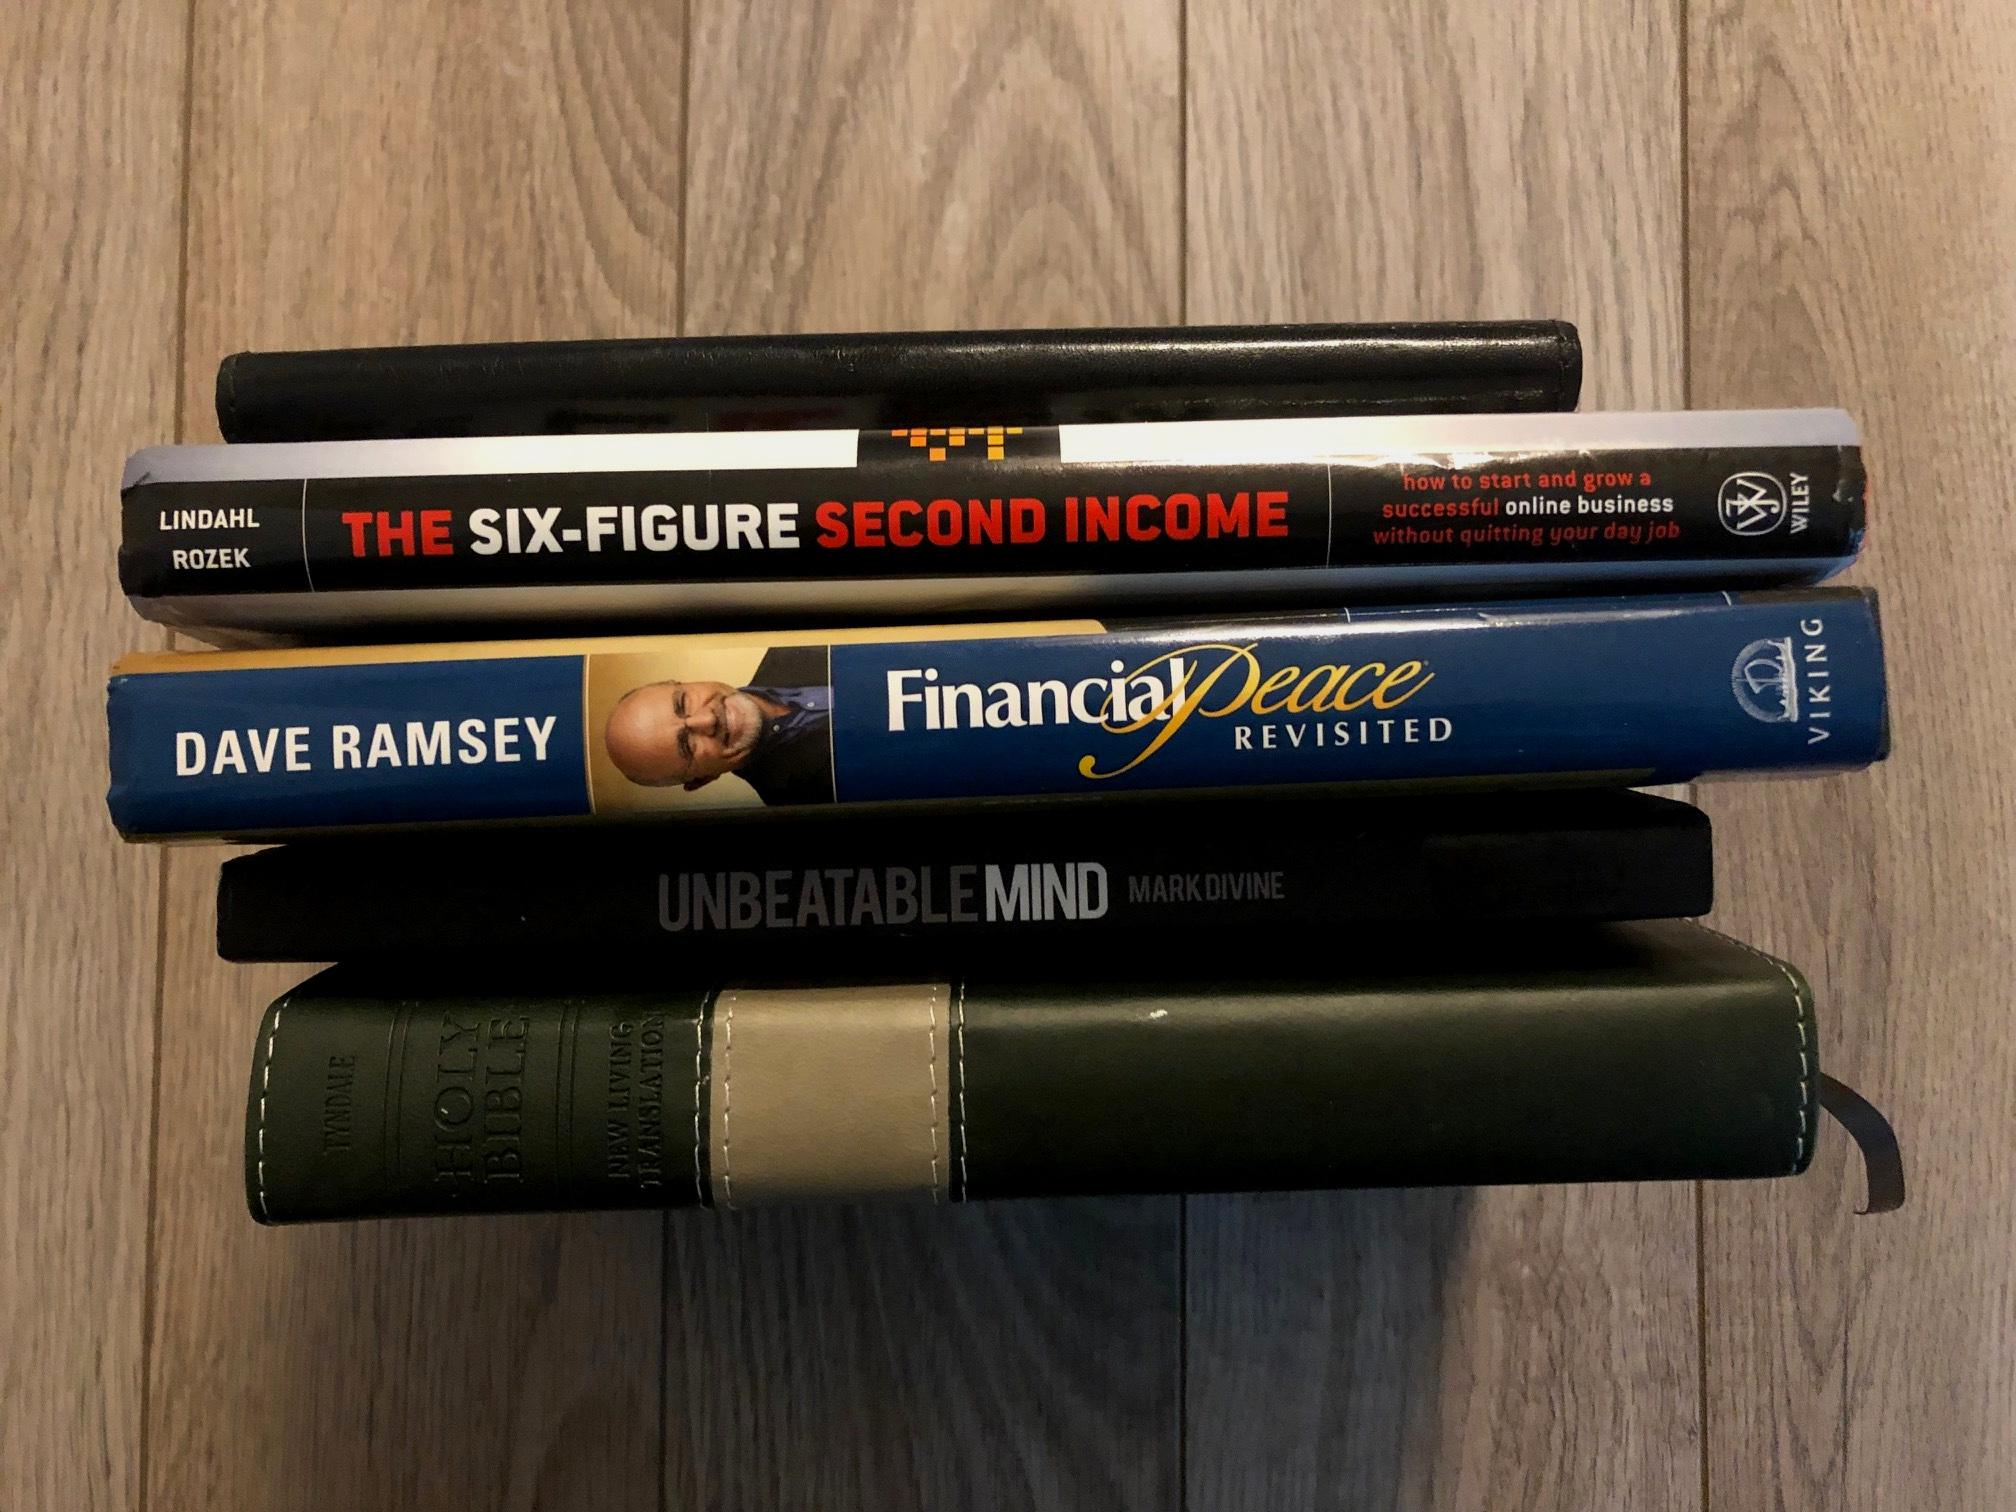 4+Books+every+man+should+read.jpg